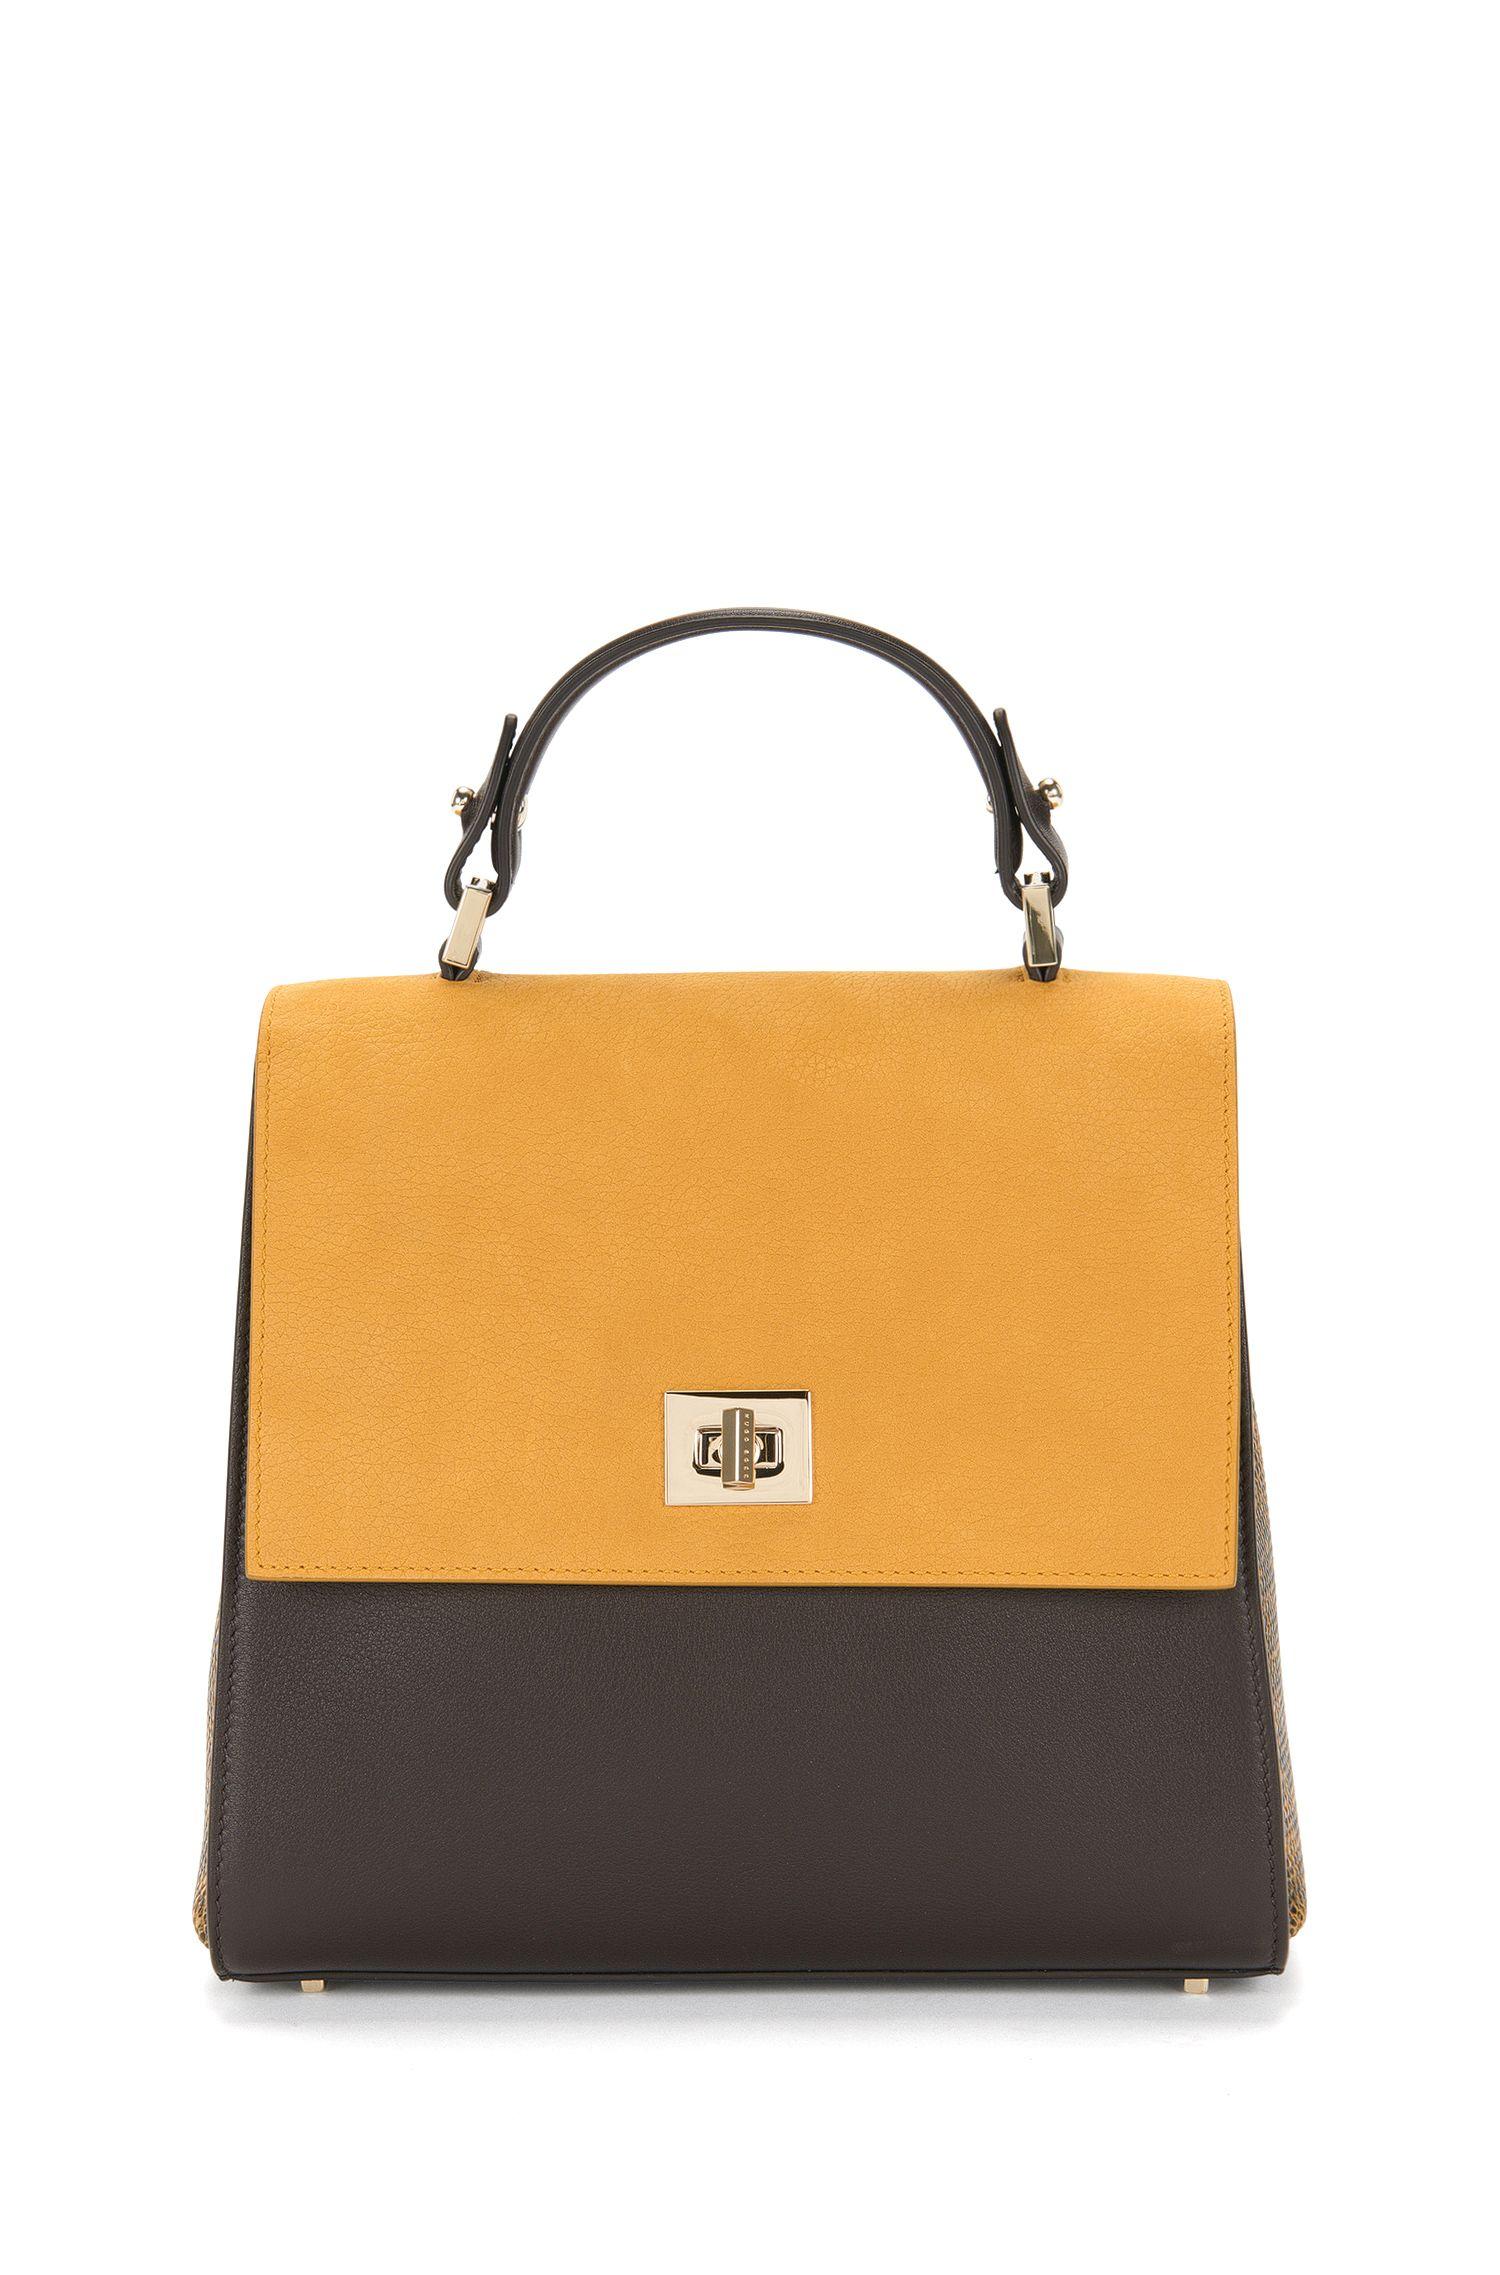 BOSS Bespoke Handtasche aus Leder im Struktur-Mix